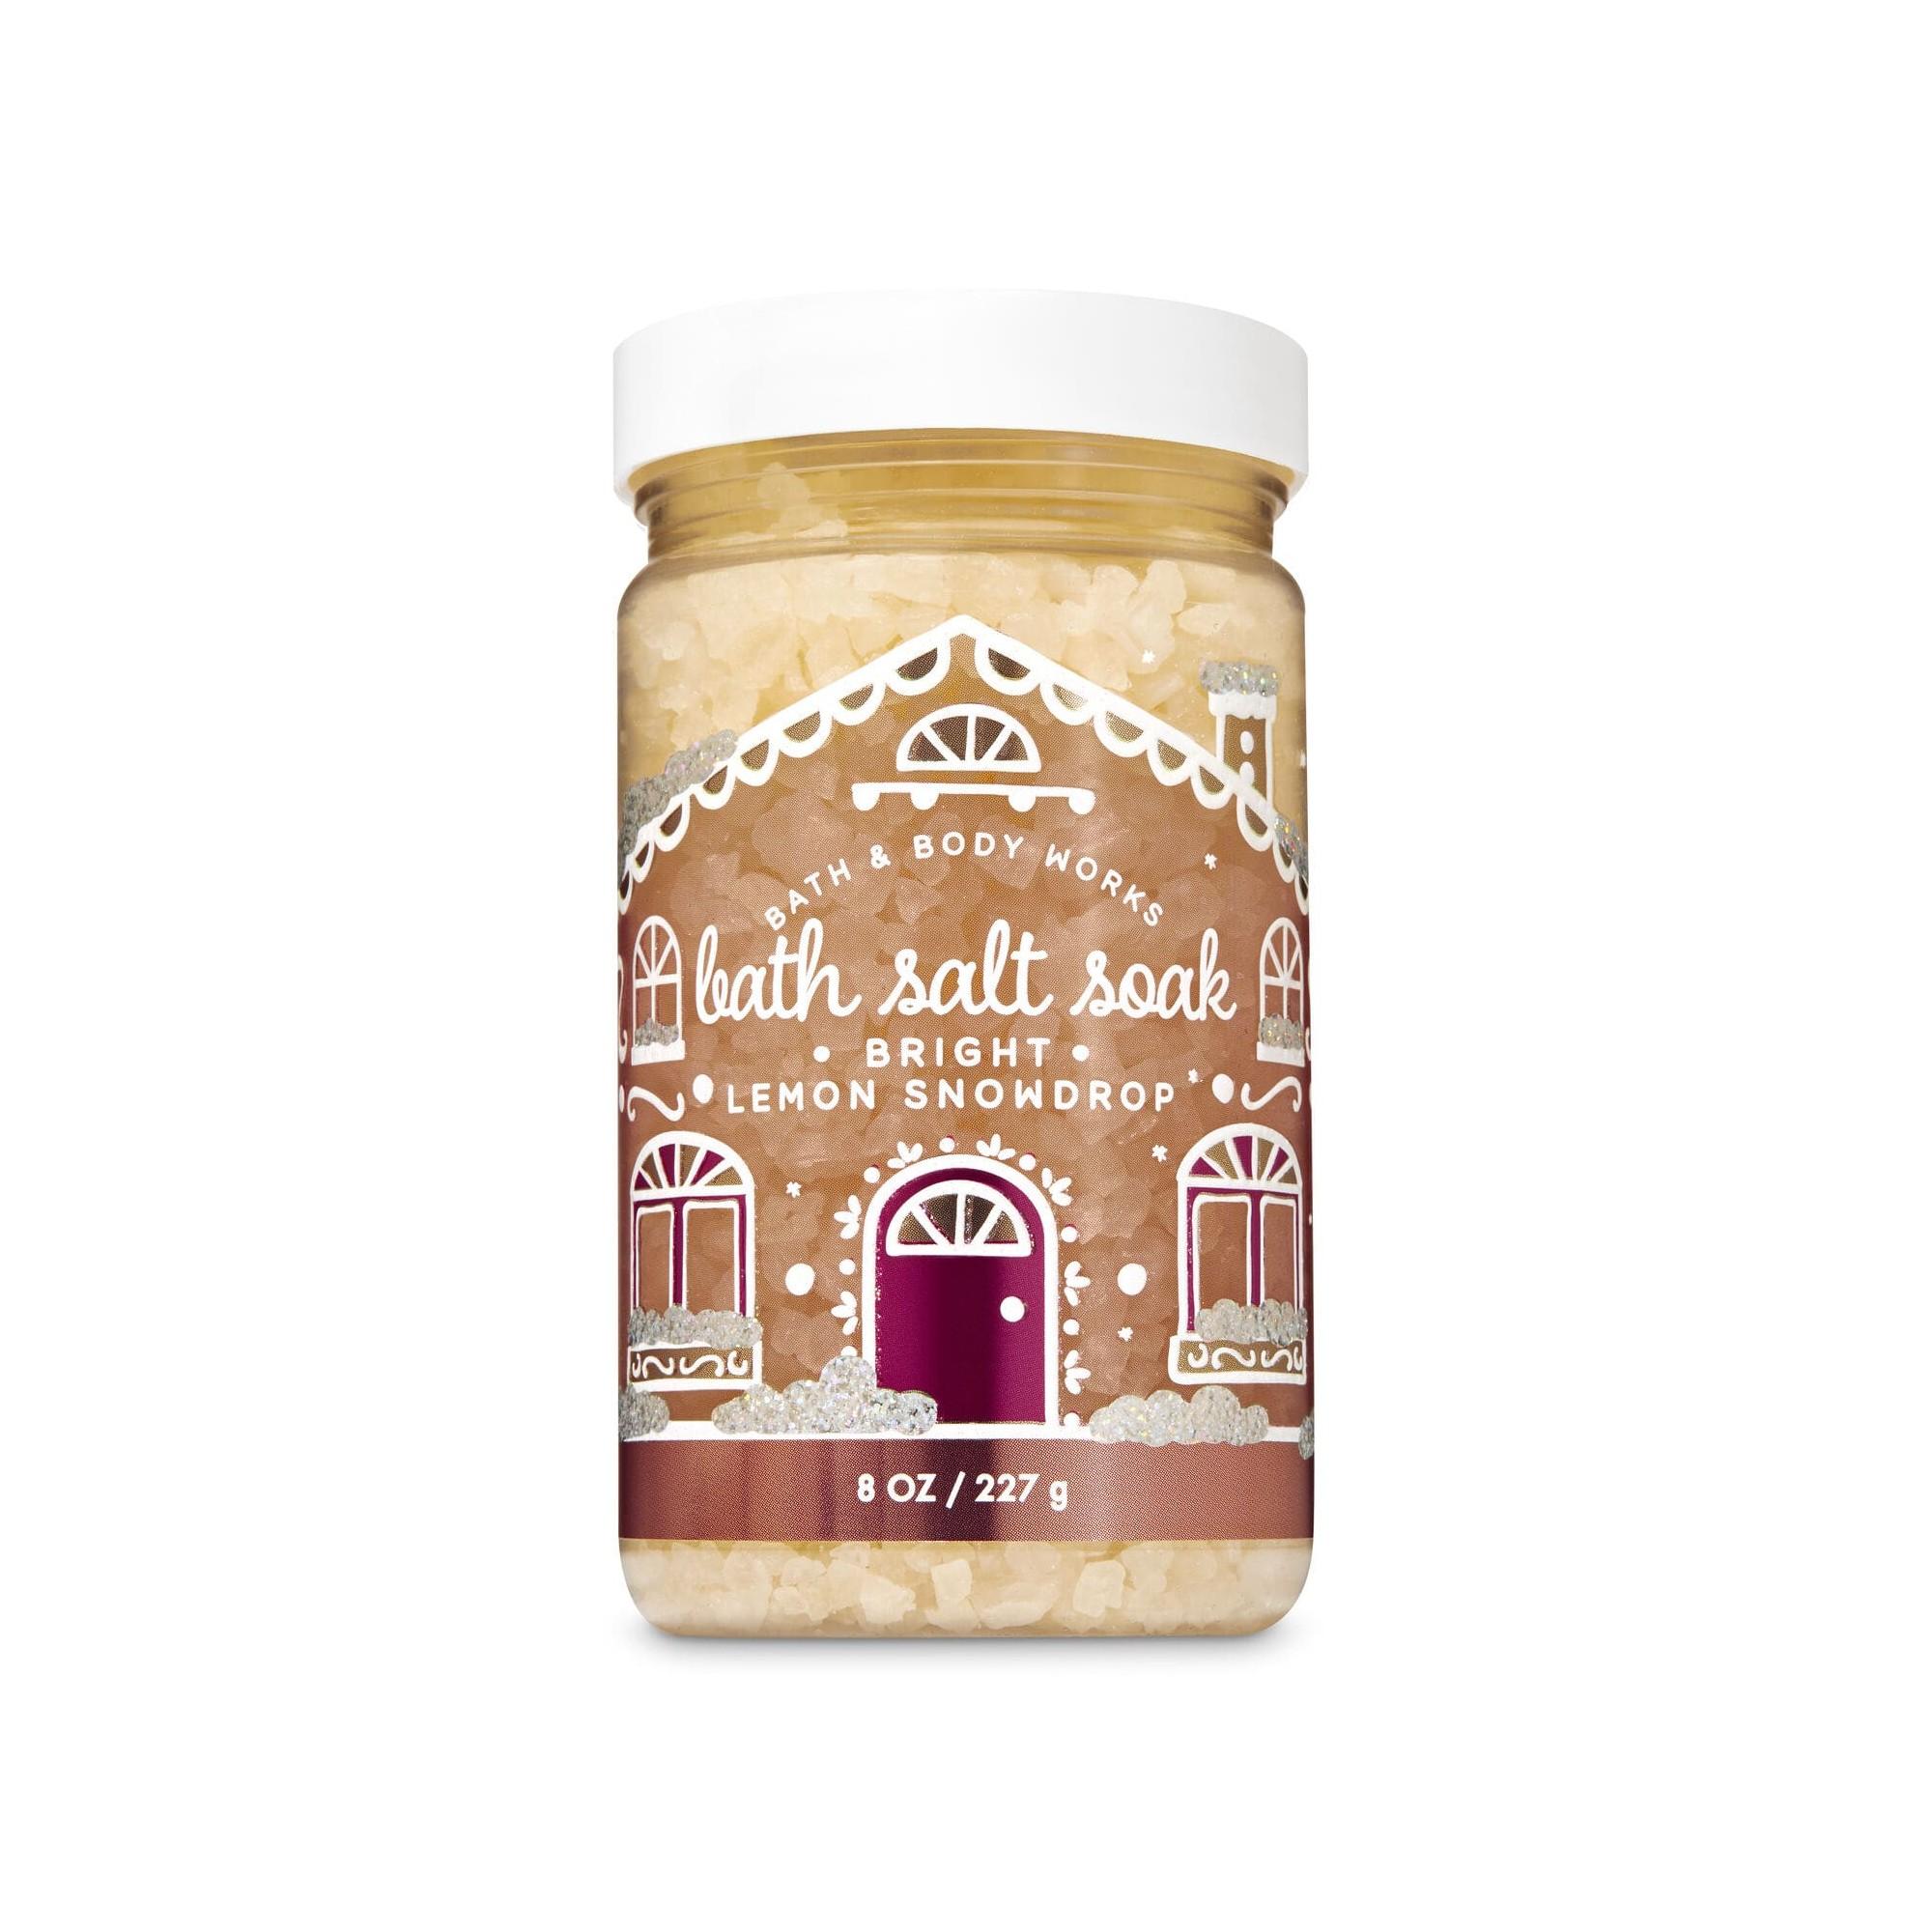 Bath & Body Works Bright Lemon Snowdrop Bath Salt Soak